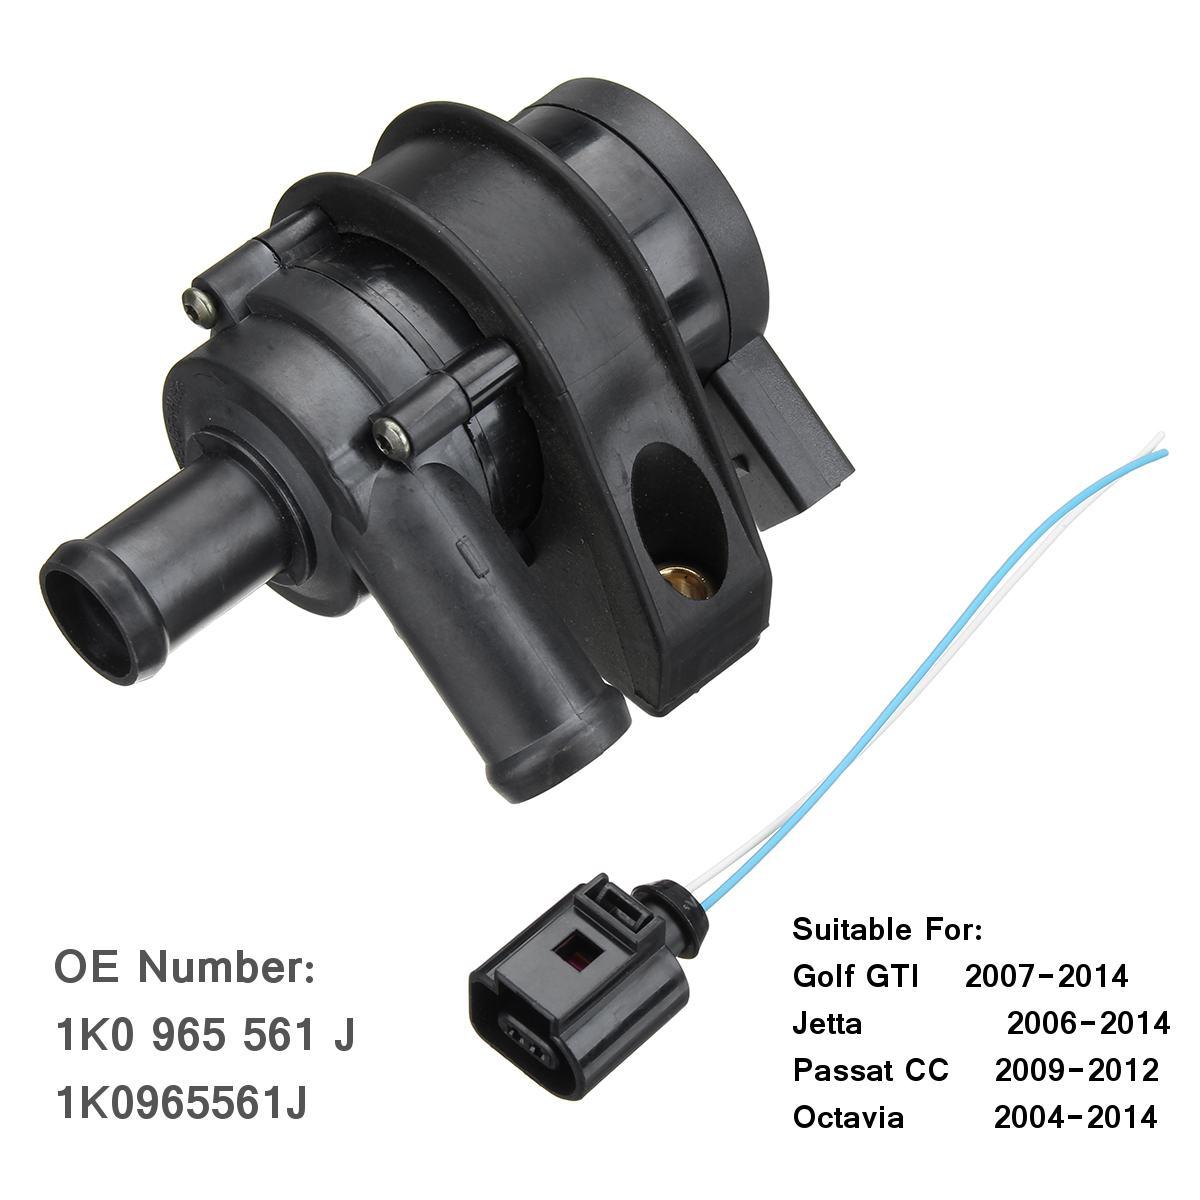 Auto Waterpomp Connect Plug Kabel 1K0965561J 1K0965561G Voor Vw Jetta Golf Gti Passat Cc Octavia 1.8 T 2.0 T 12 V